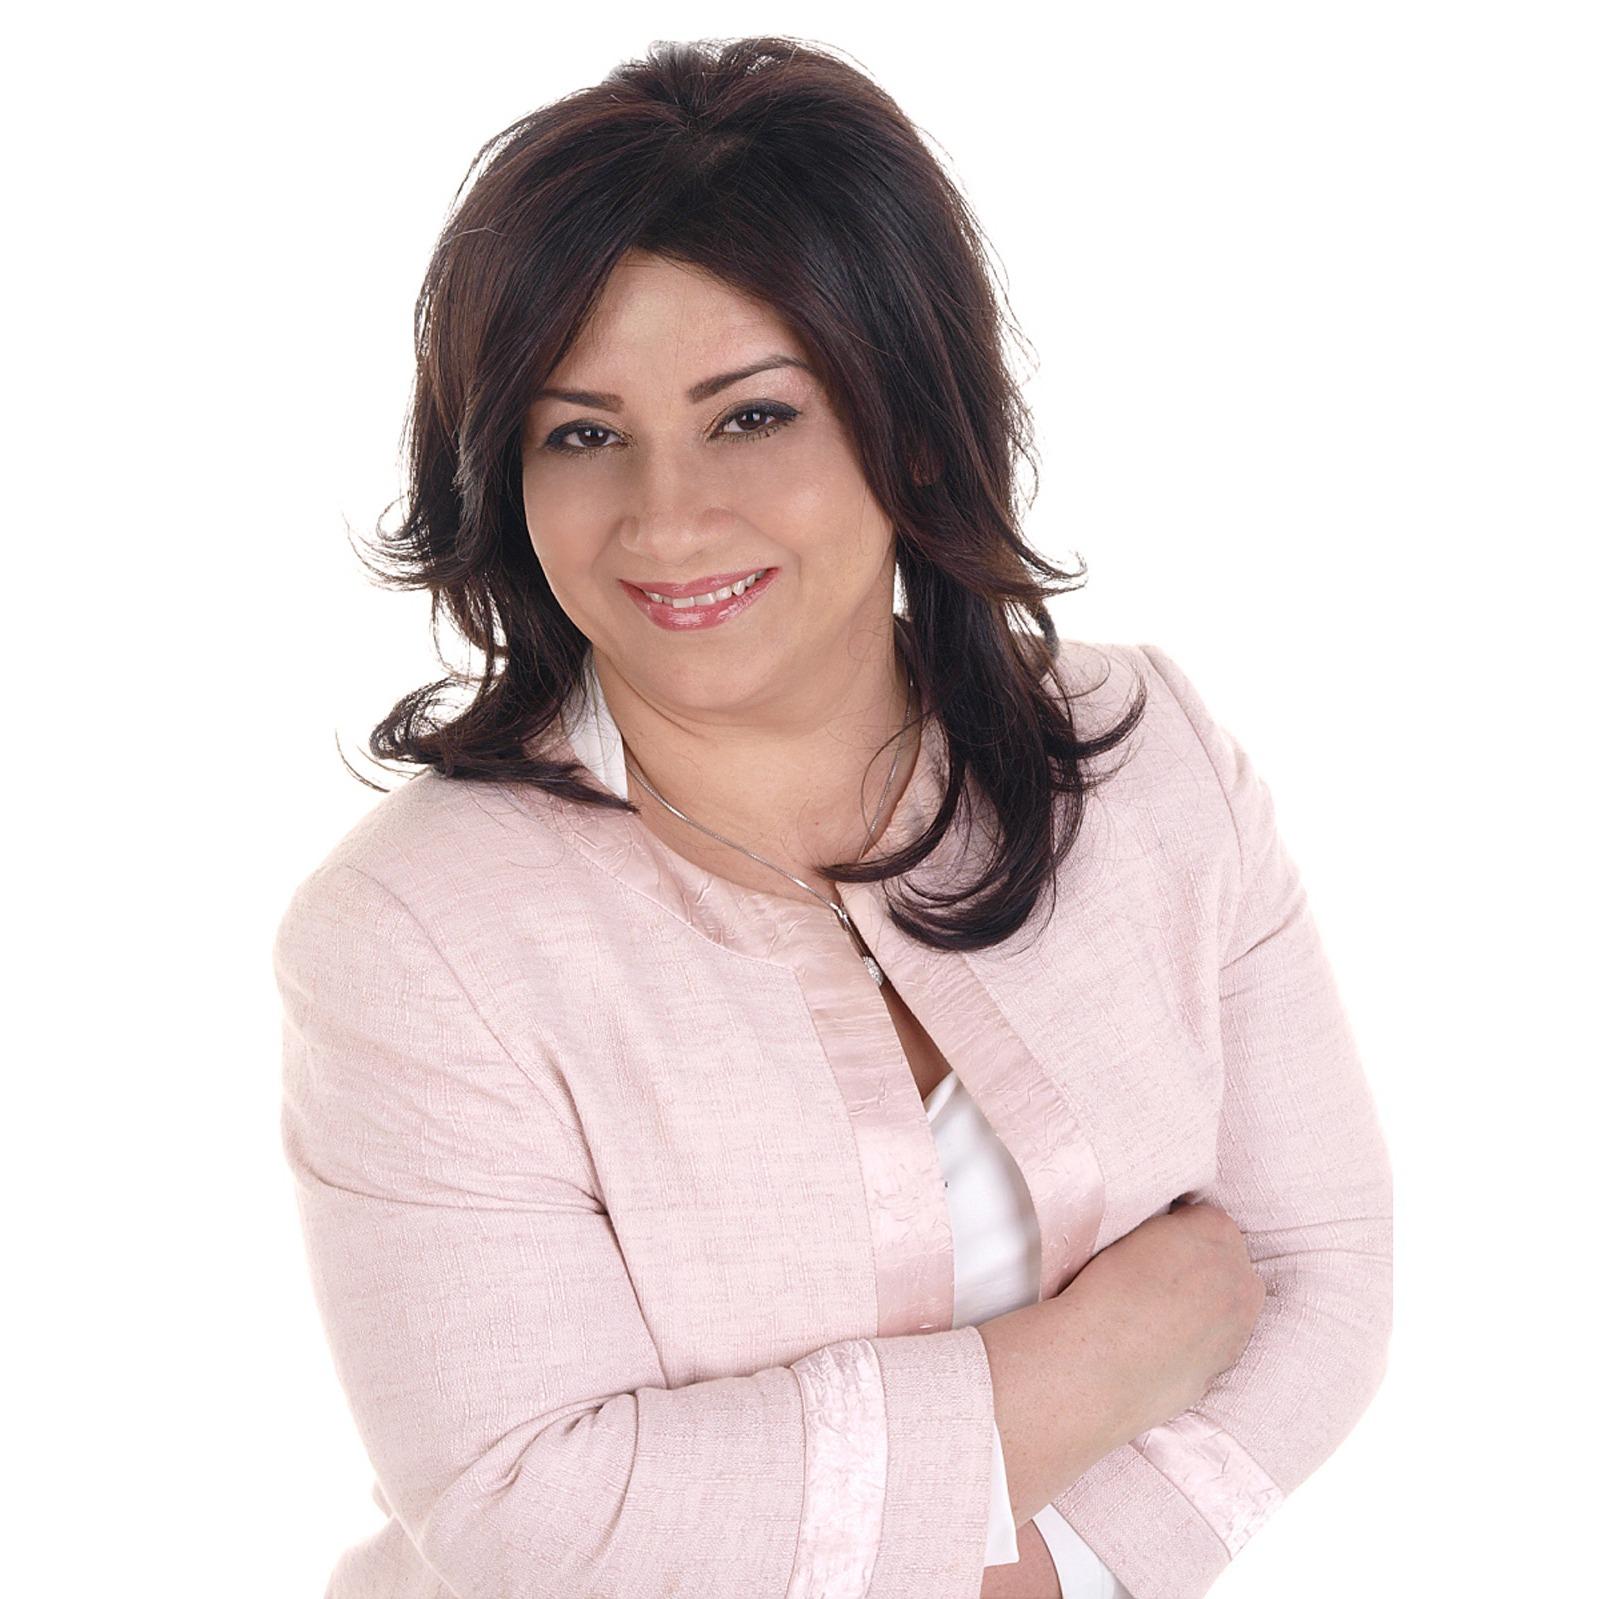 Masoumeh Alimohammadi